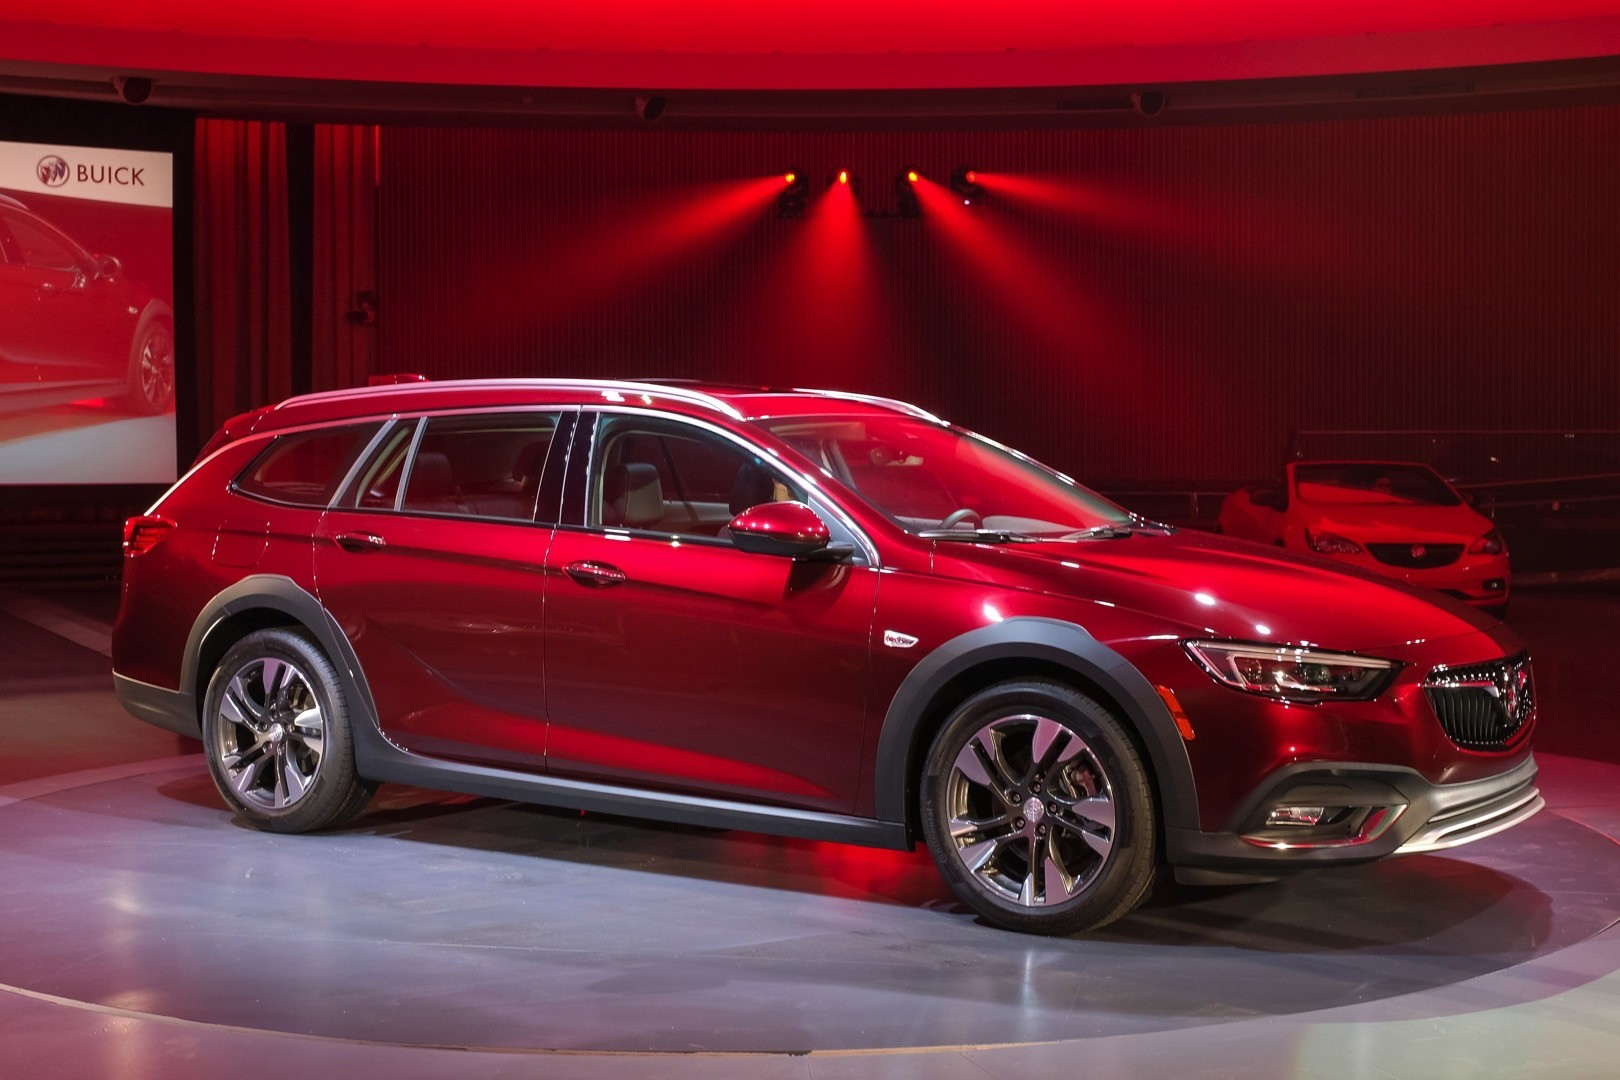 buick introduces 2018 regal sportback sedan and 2018 regal tourx wagon autoevolution. Black Bedroom Furniture Sets. Home Design Ideas